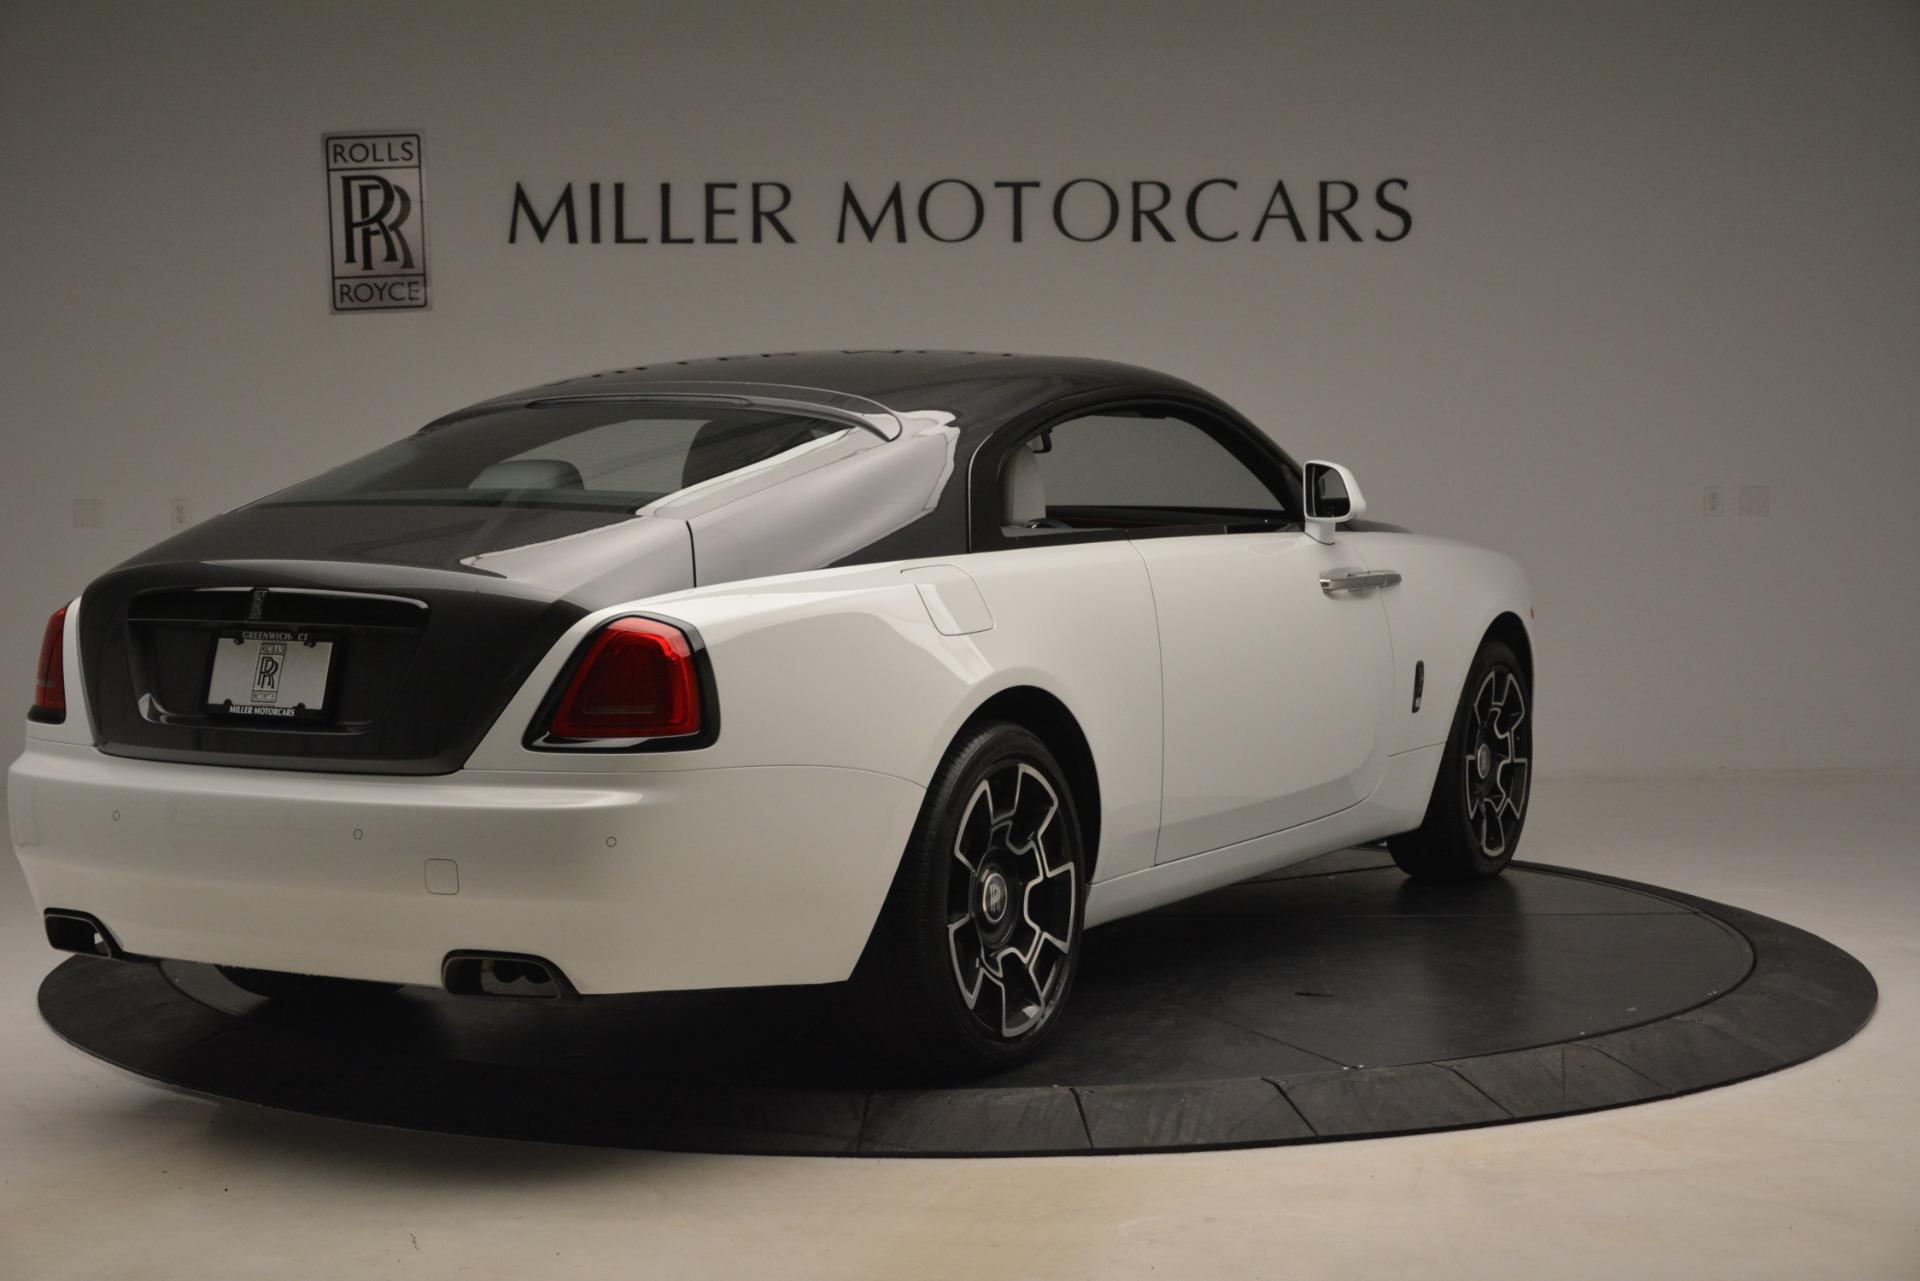 Used 2018 Rolls Royce Wraith Black Badge Nebula Collection